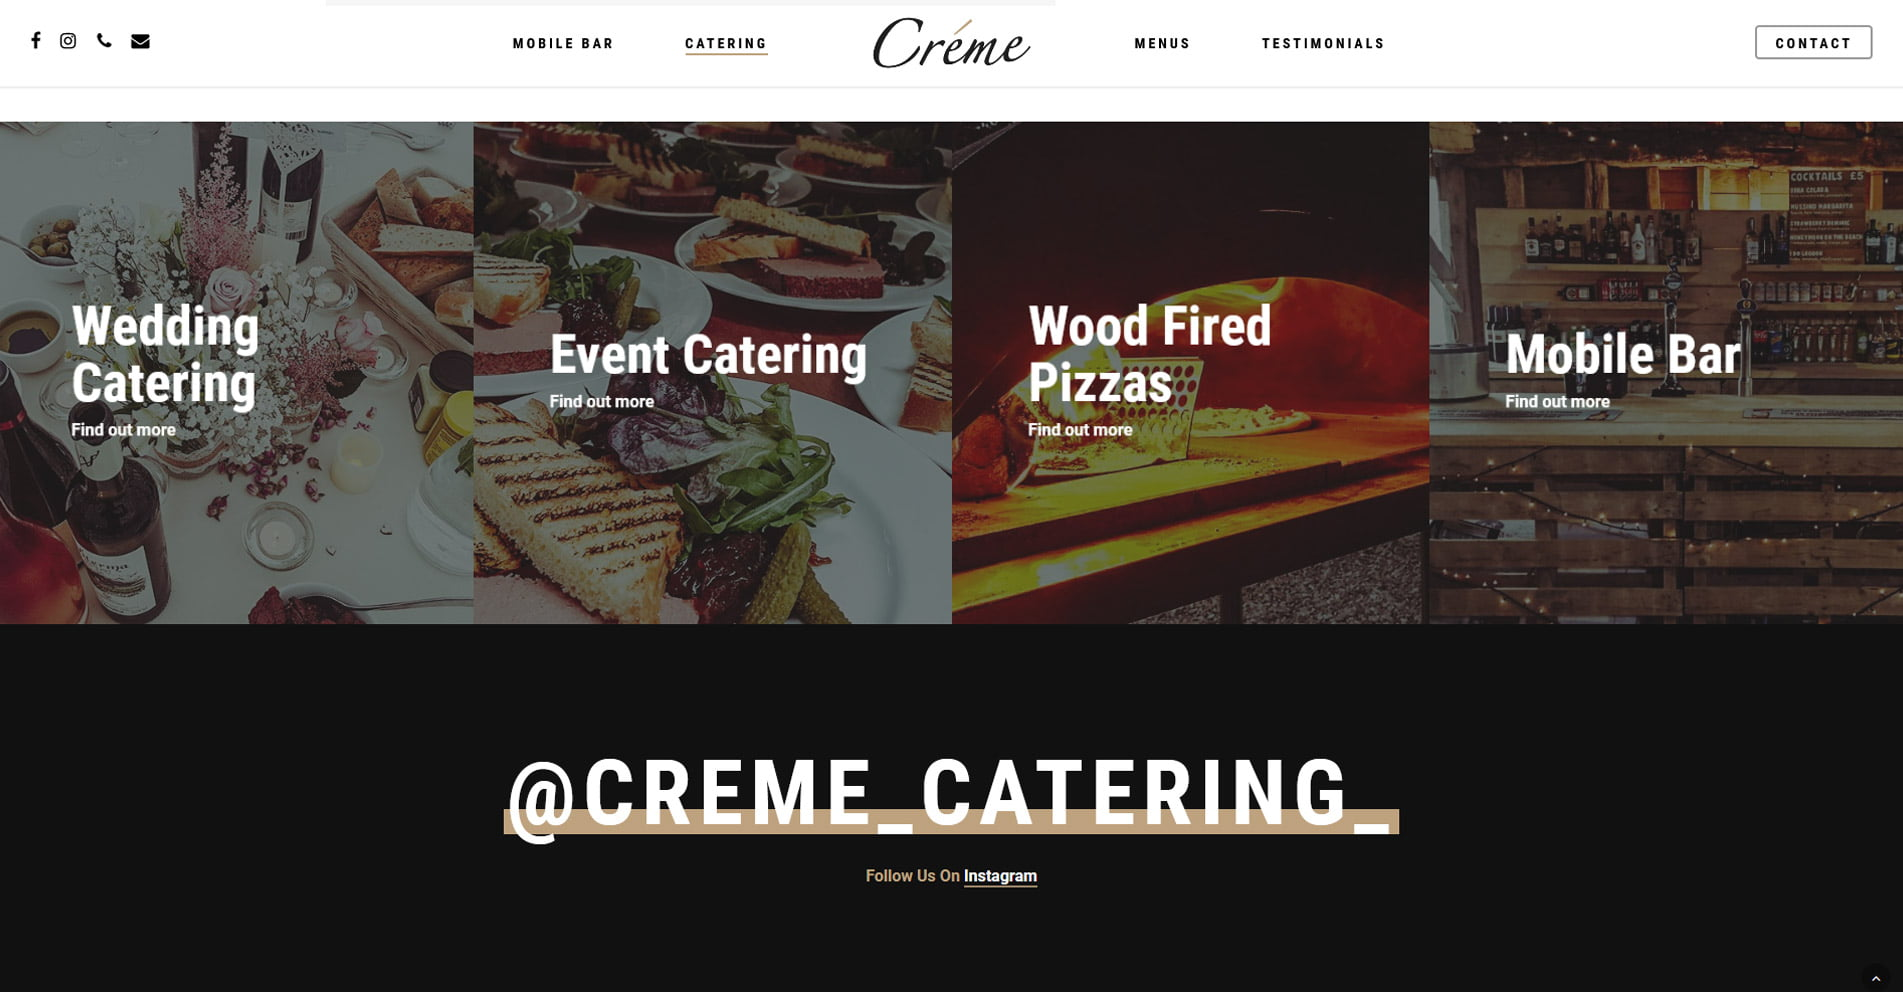 Creme Catering